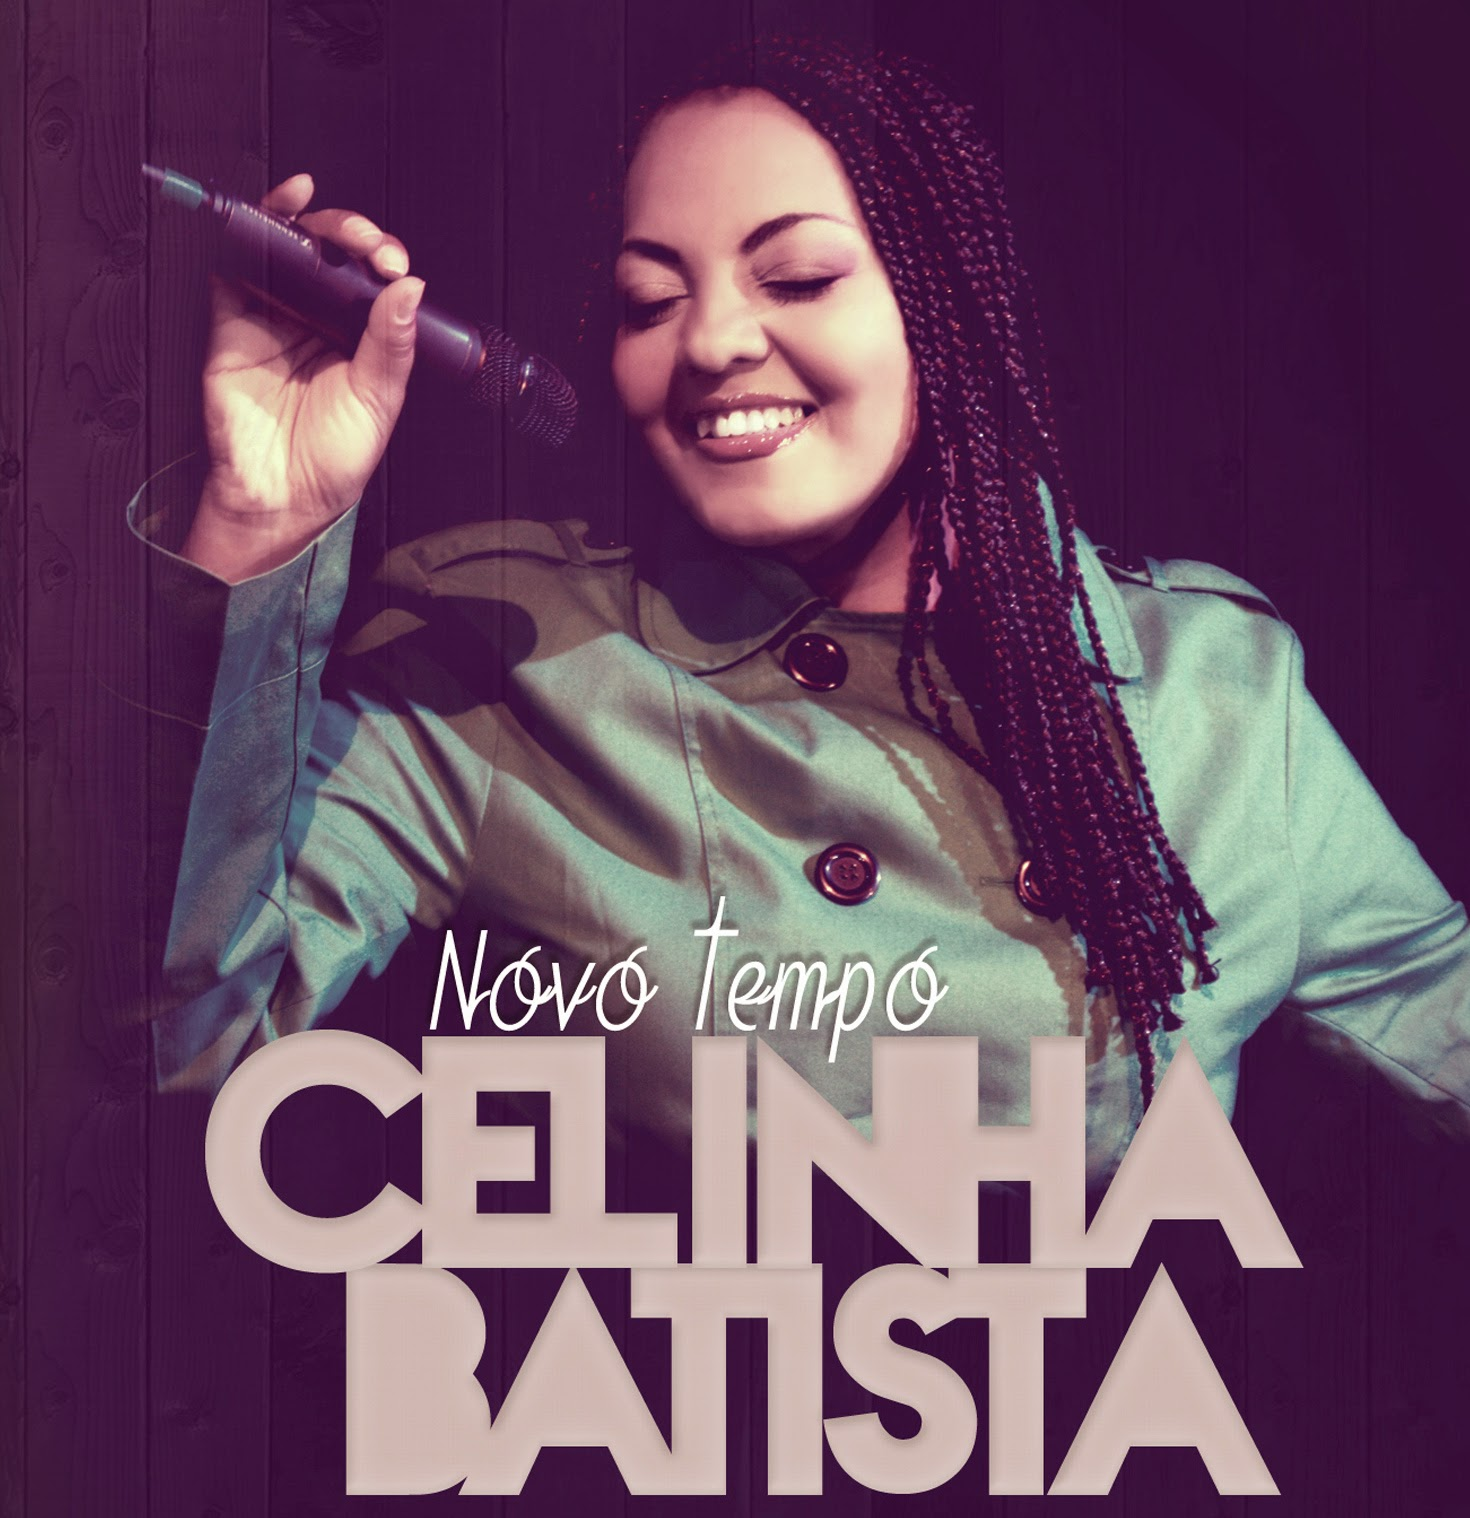 Celinha Batista